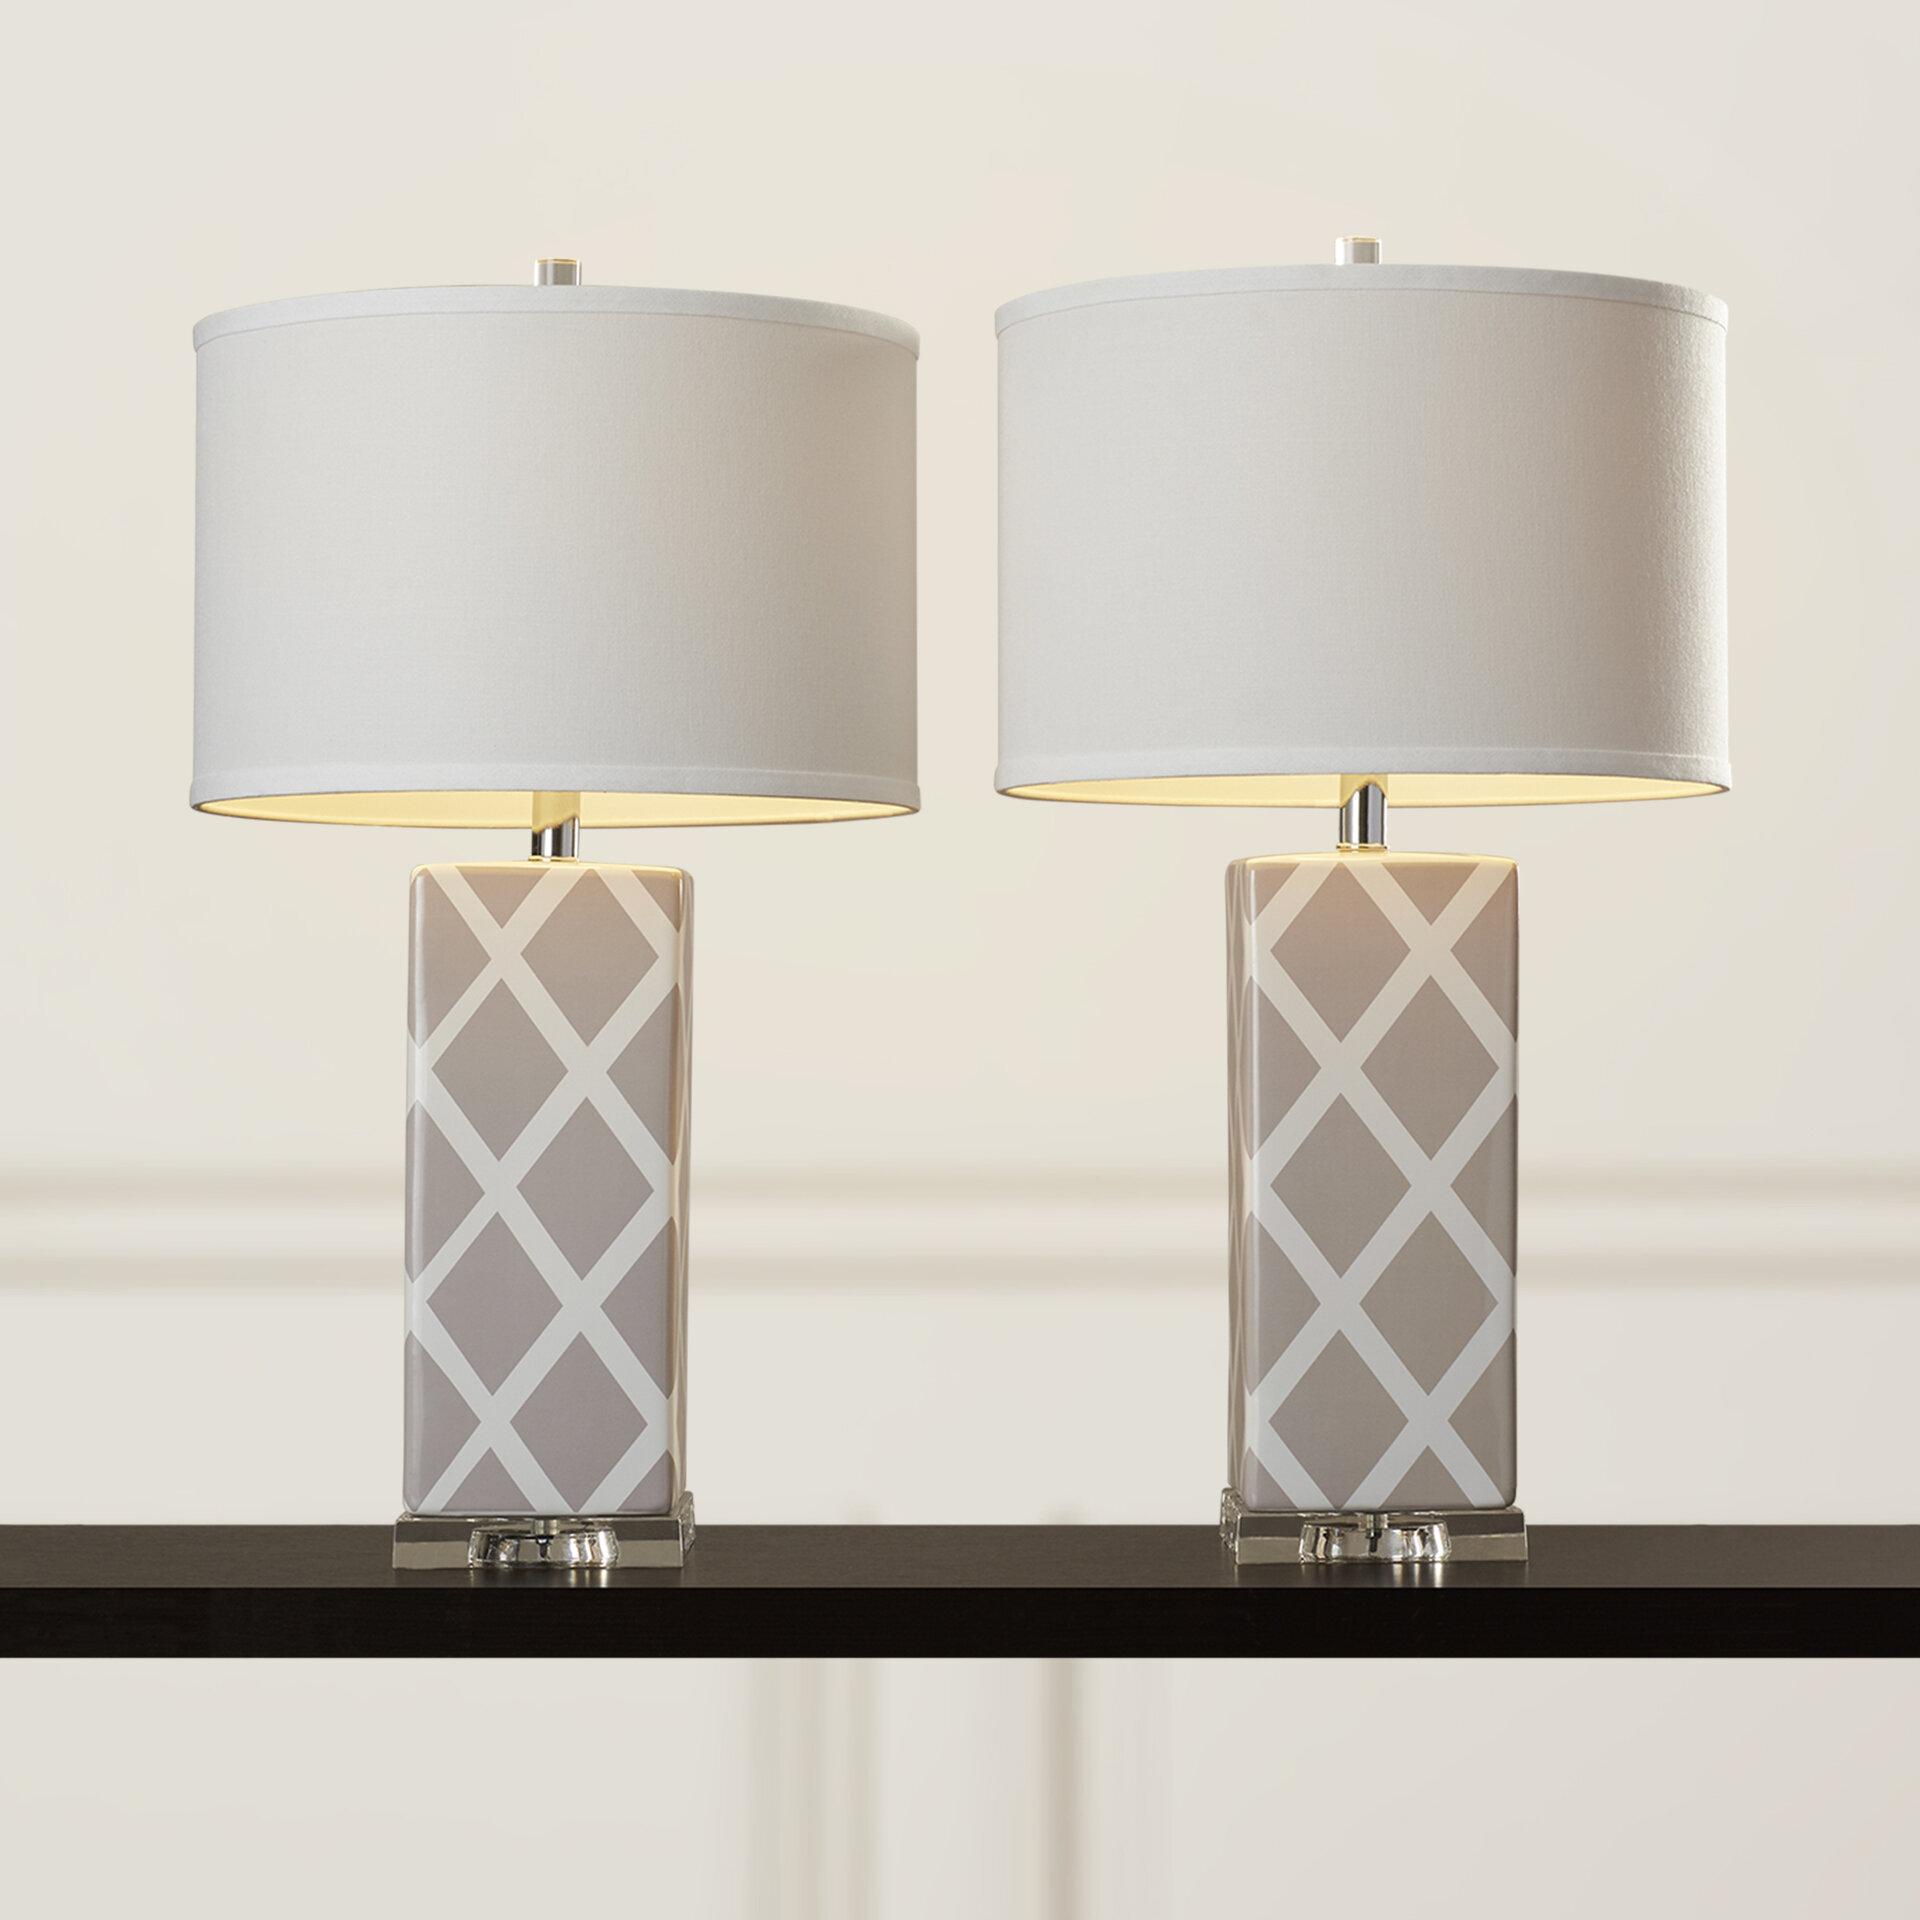 Baret table lamp set reviews birch lane